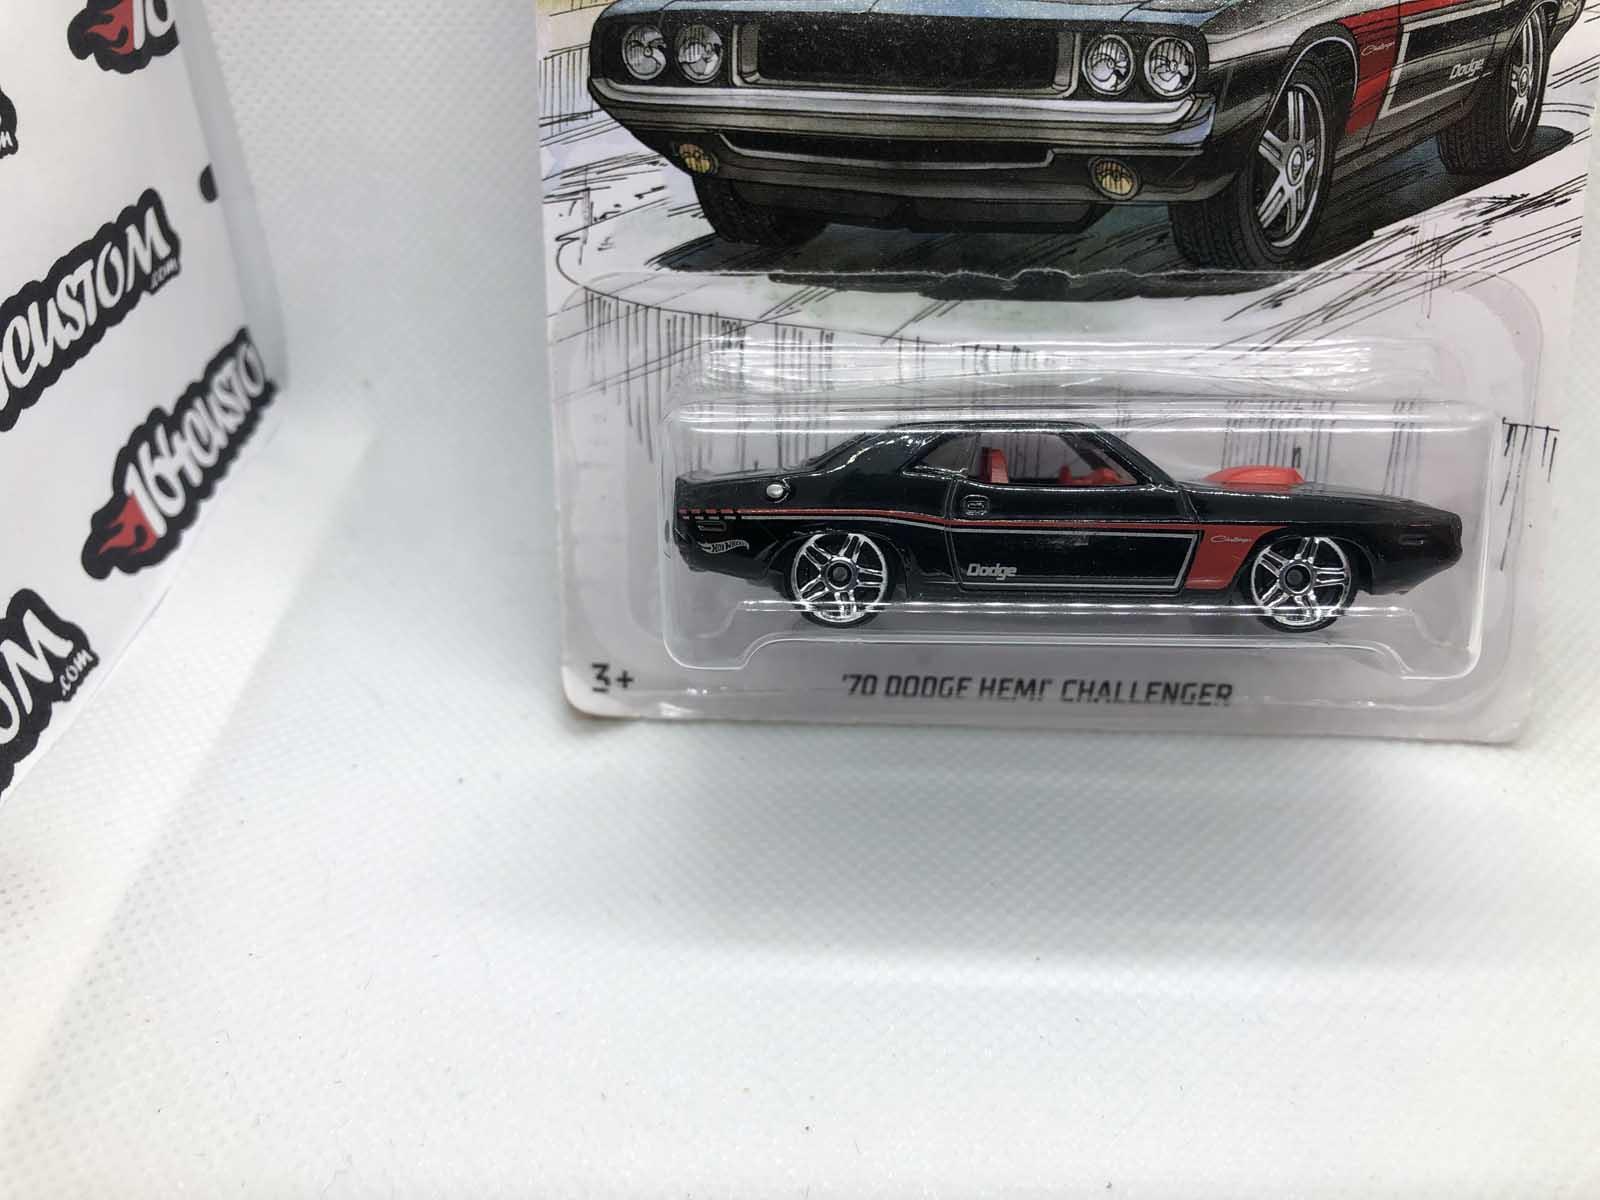 70 Dodge Hemi Challenger